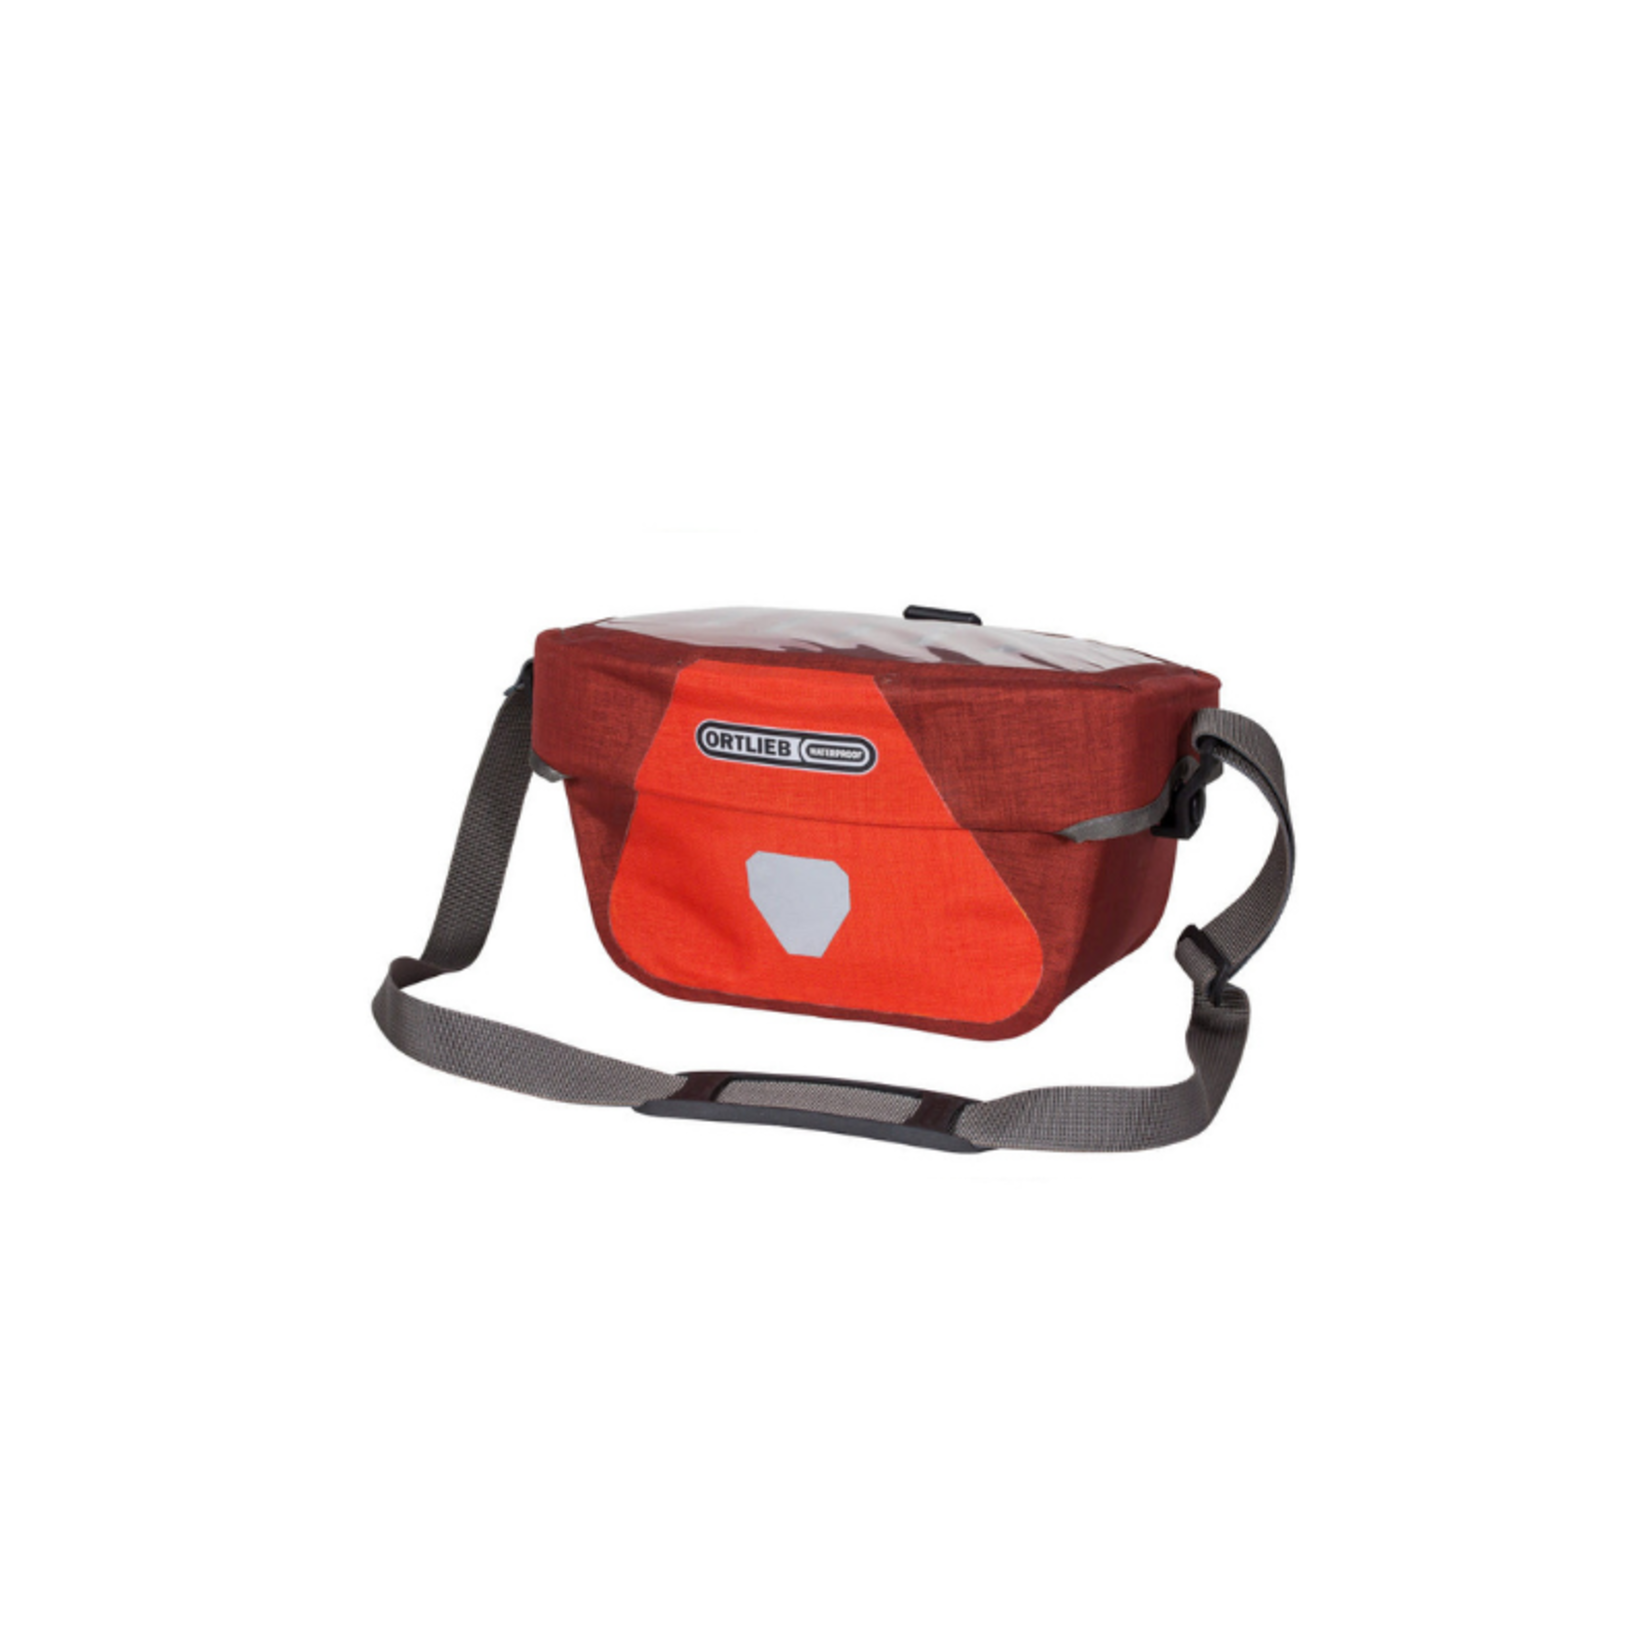 Ortlieb Ortlieb Handlebar Bag Ultimate6 Plus